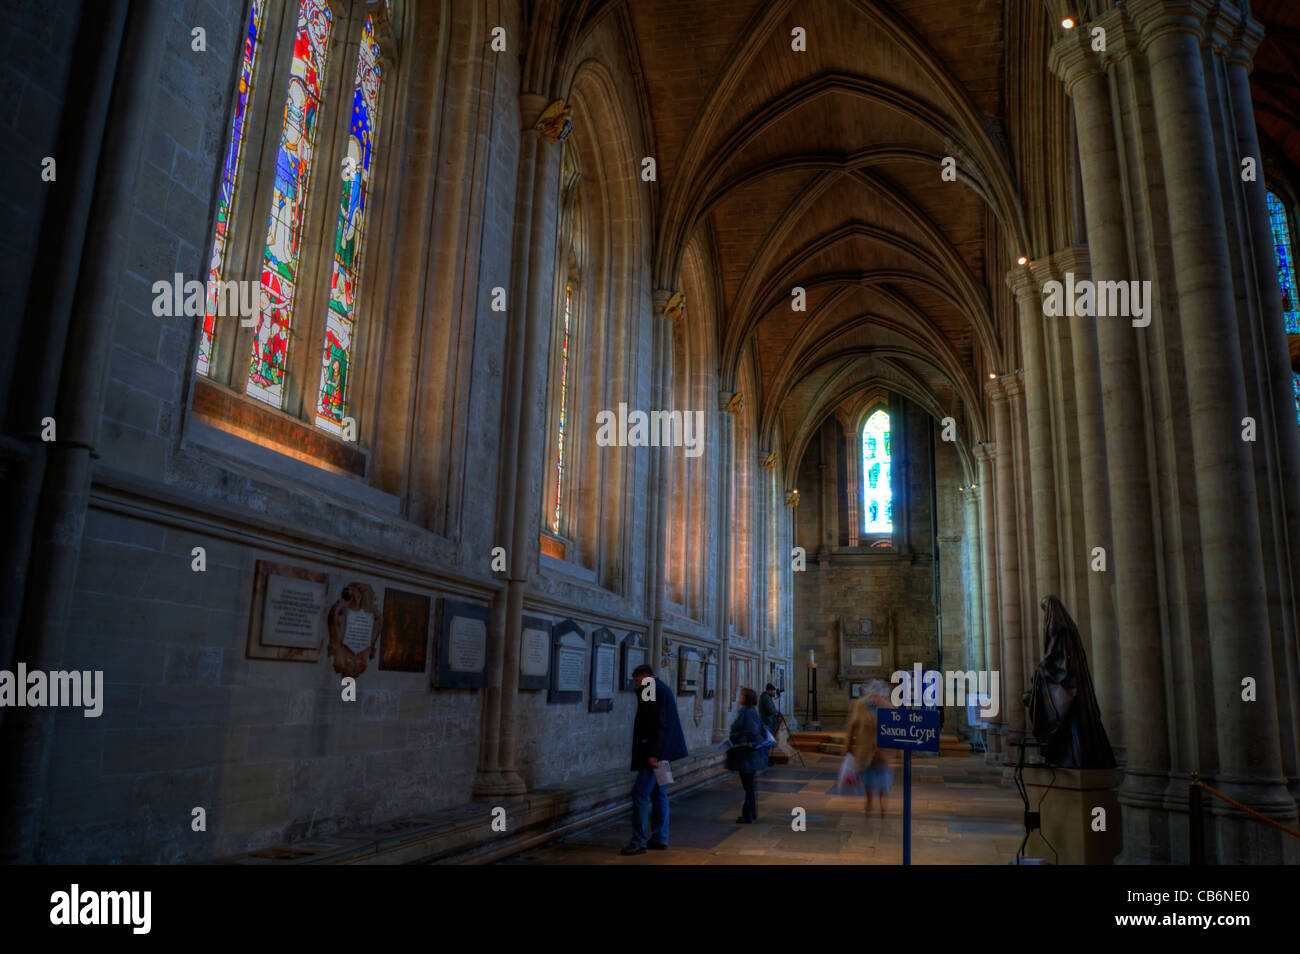 Ripon Cathedral interior - Stock Image